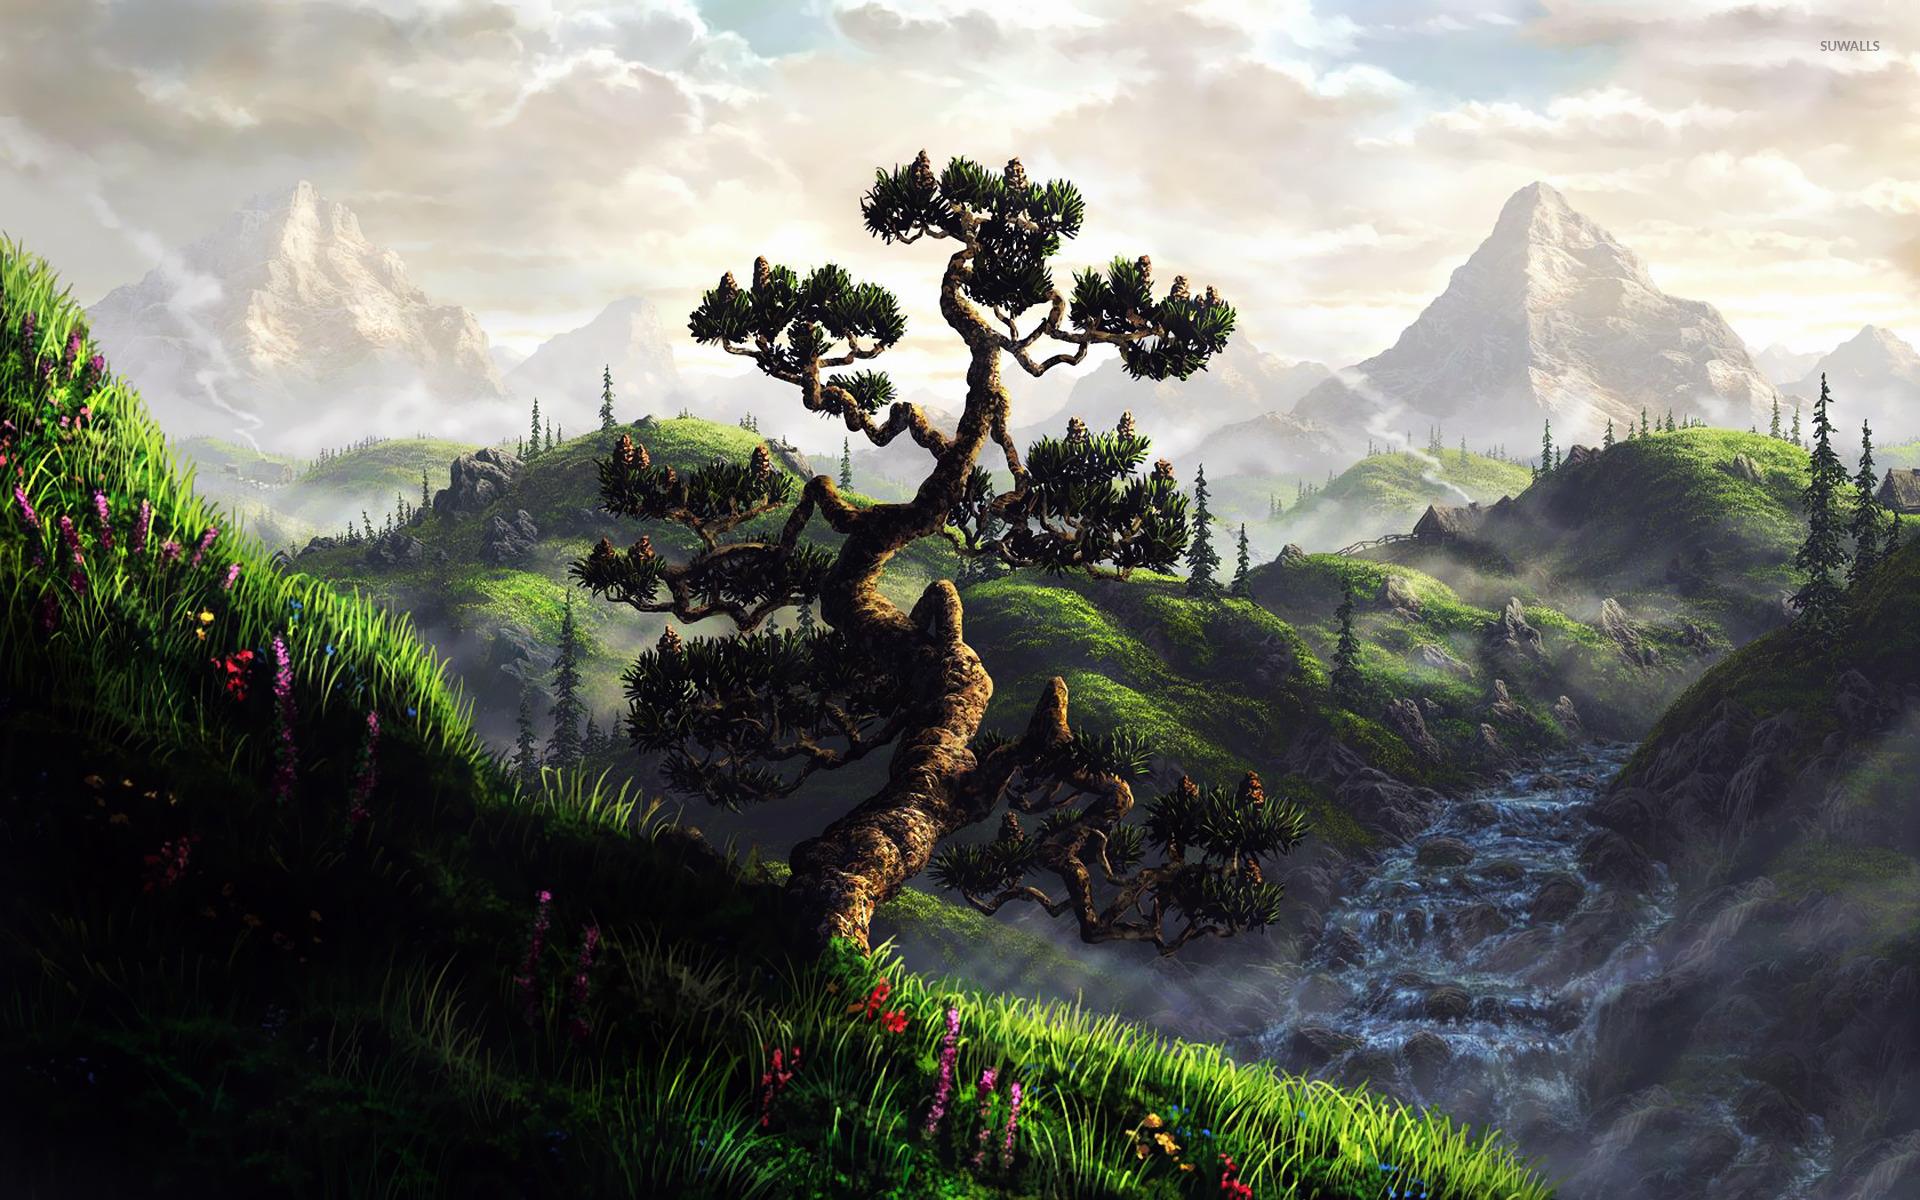 Painted Mountain Landscape wallpaper